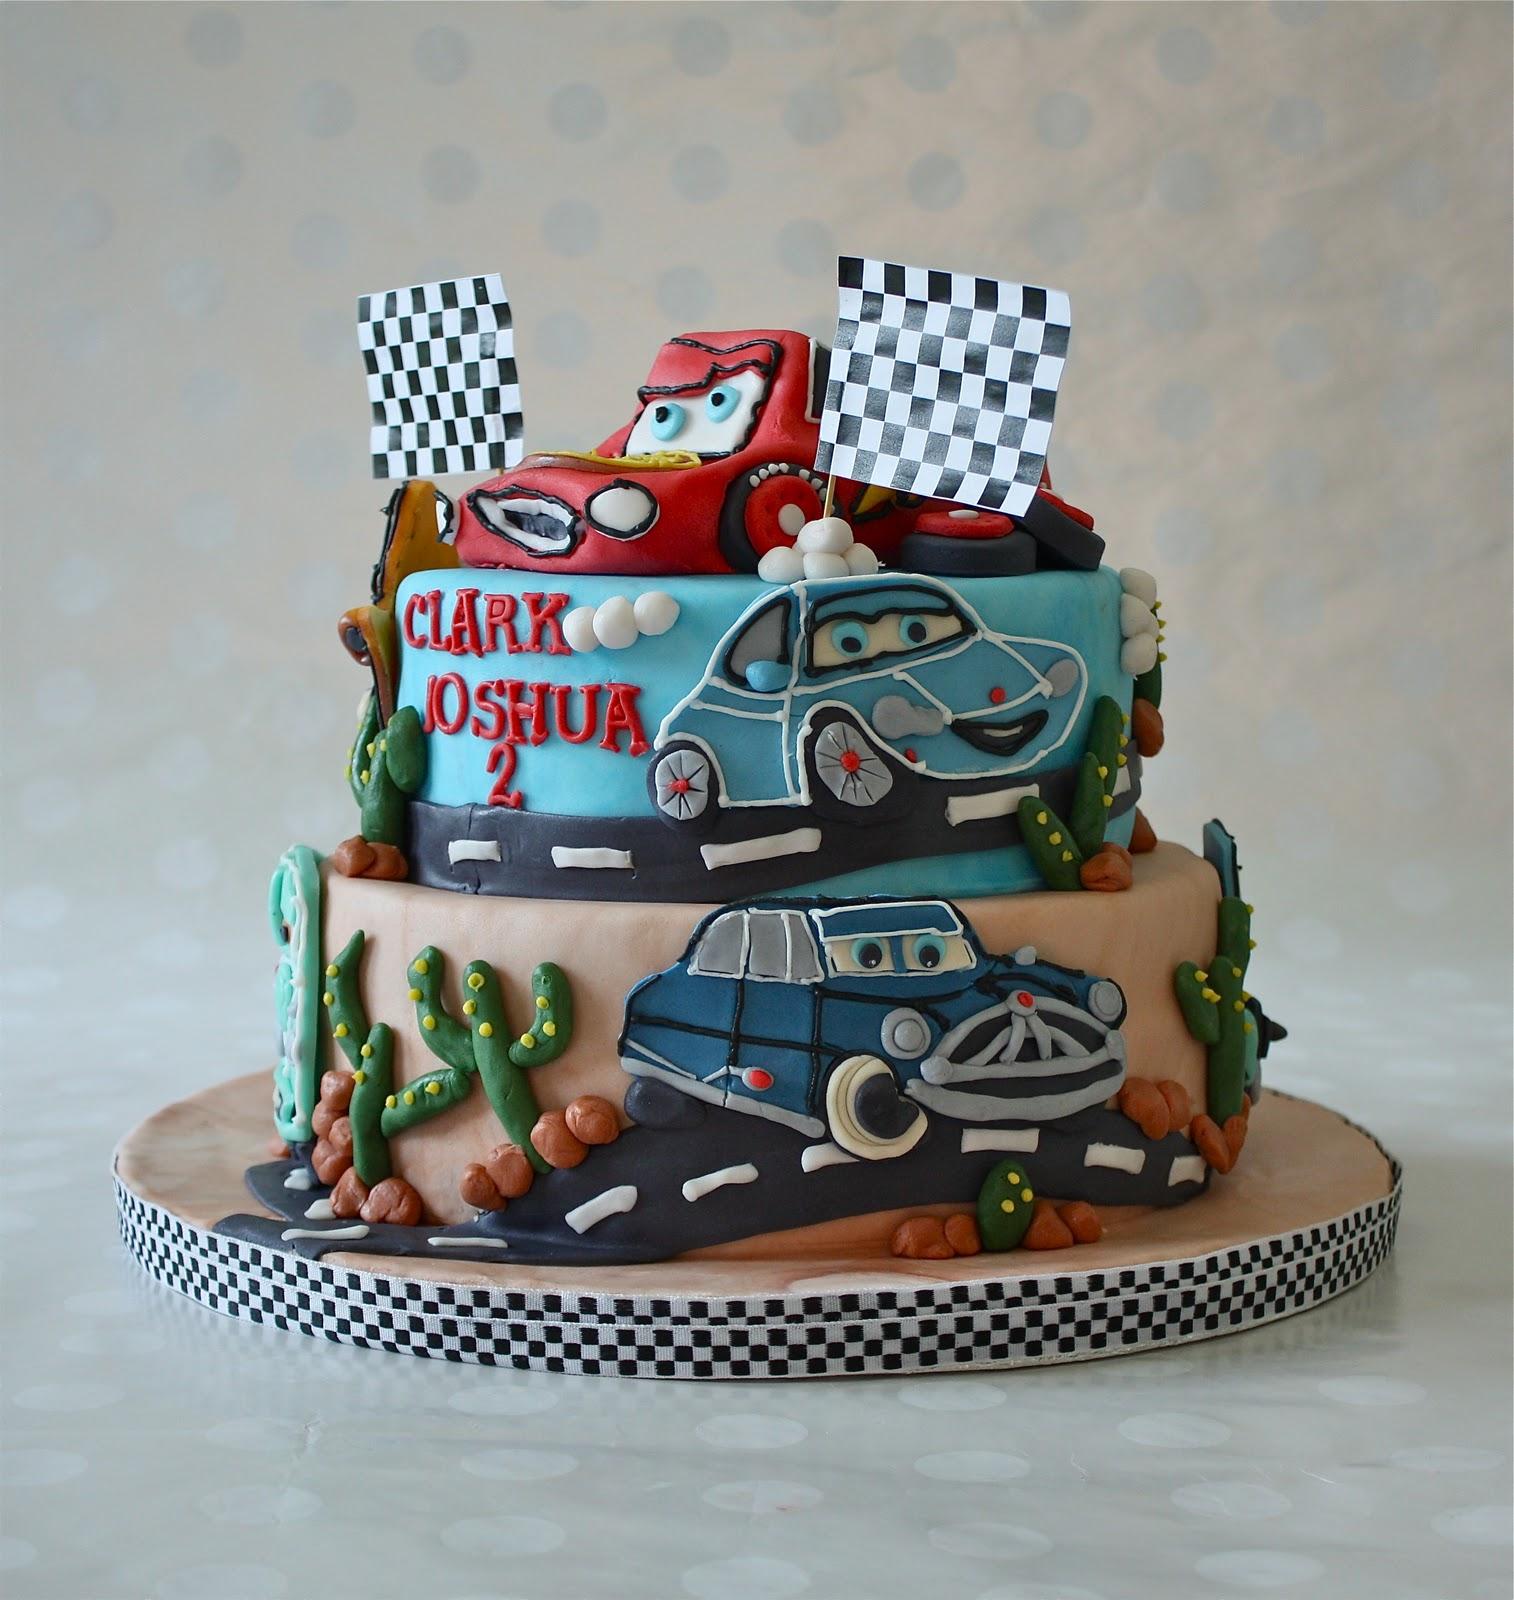 Racing Car Birthday Cake Waitrose Image Inspiration of Cake and